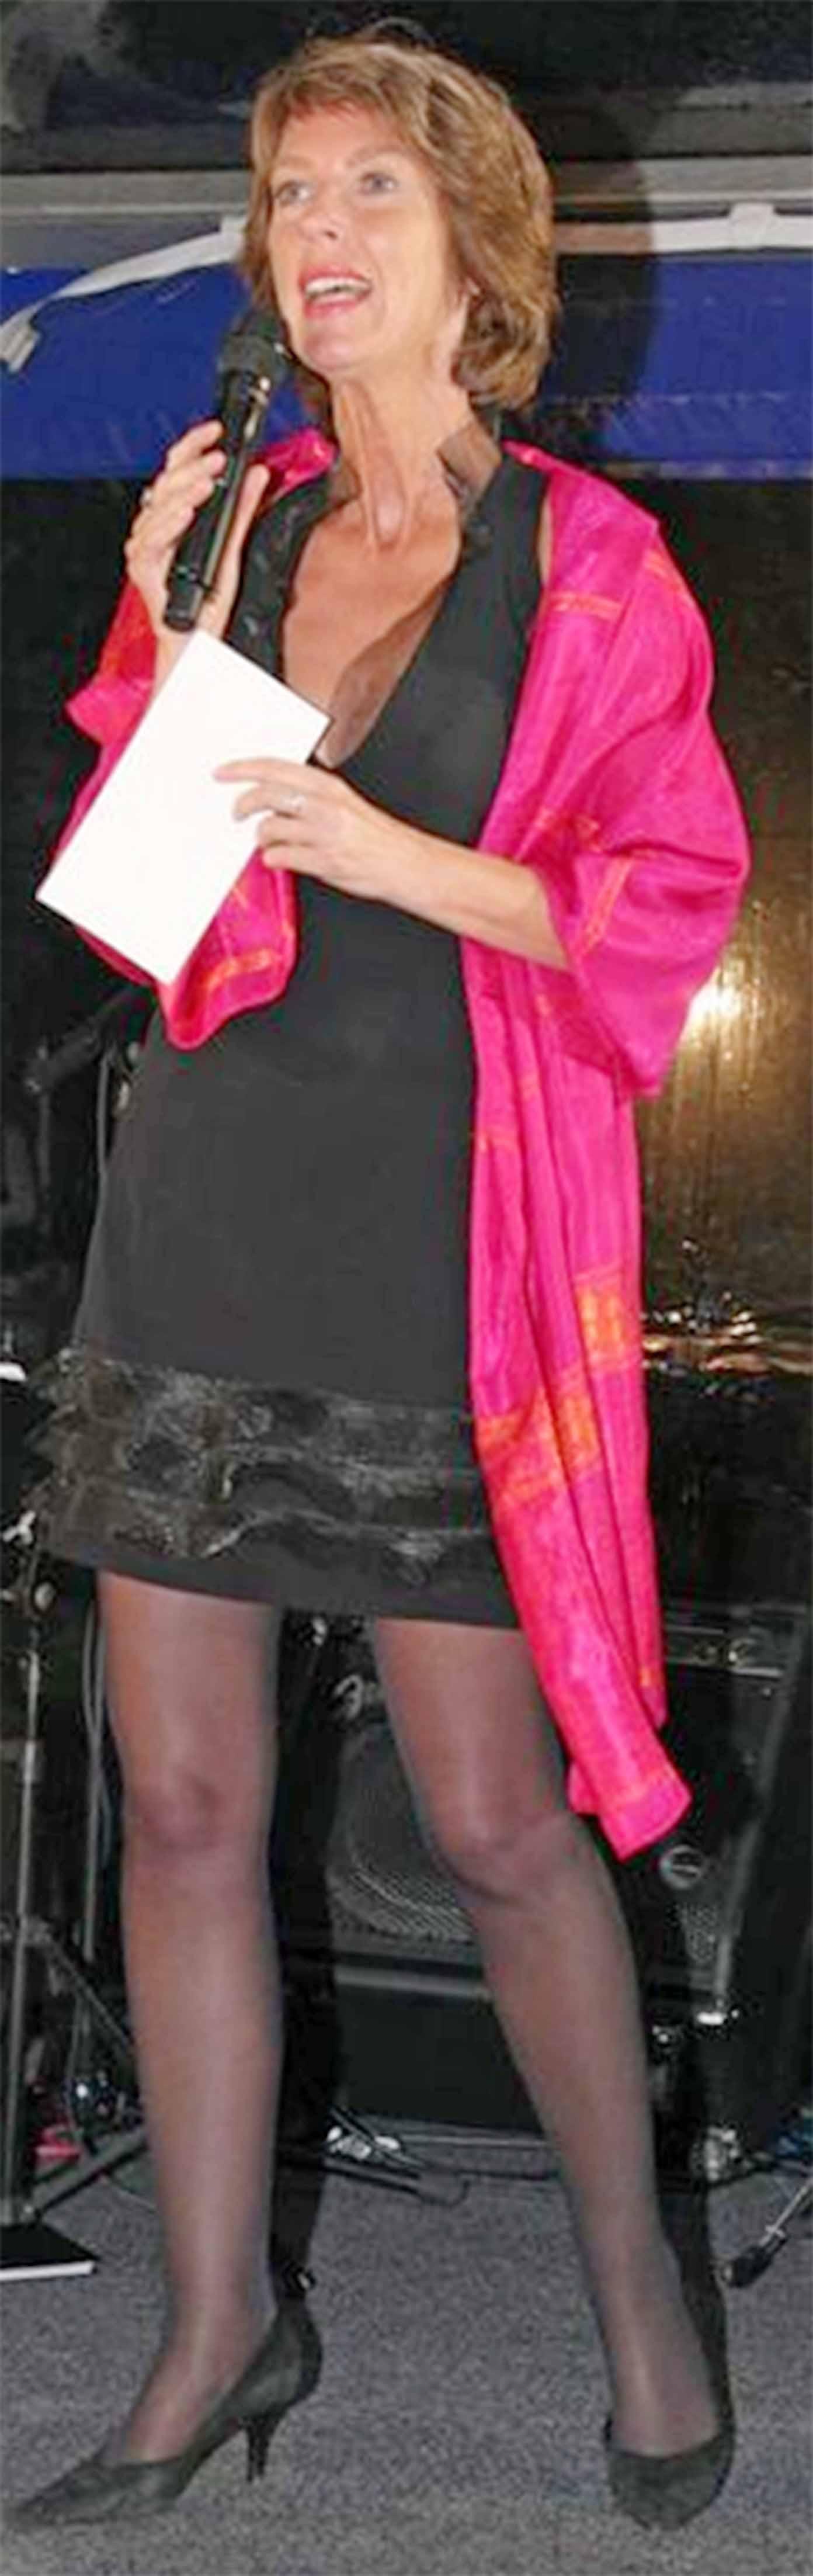 Barbara Rett  Mature And Hot  Women, Beautiful, Fashion-9374